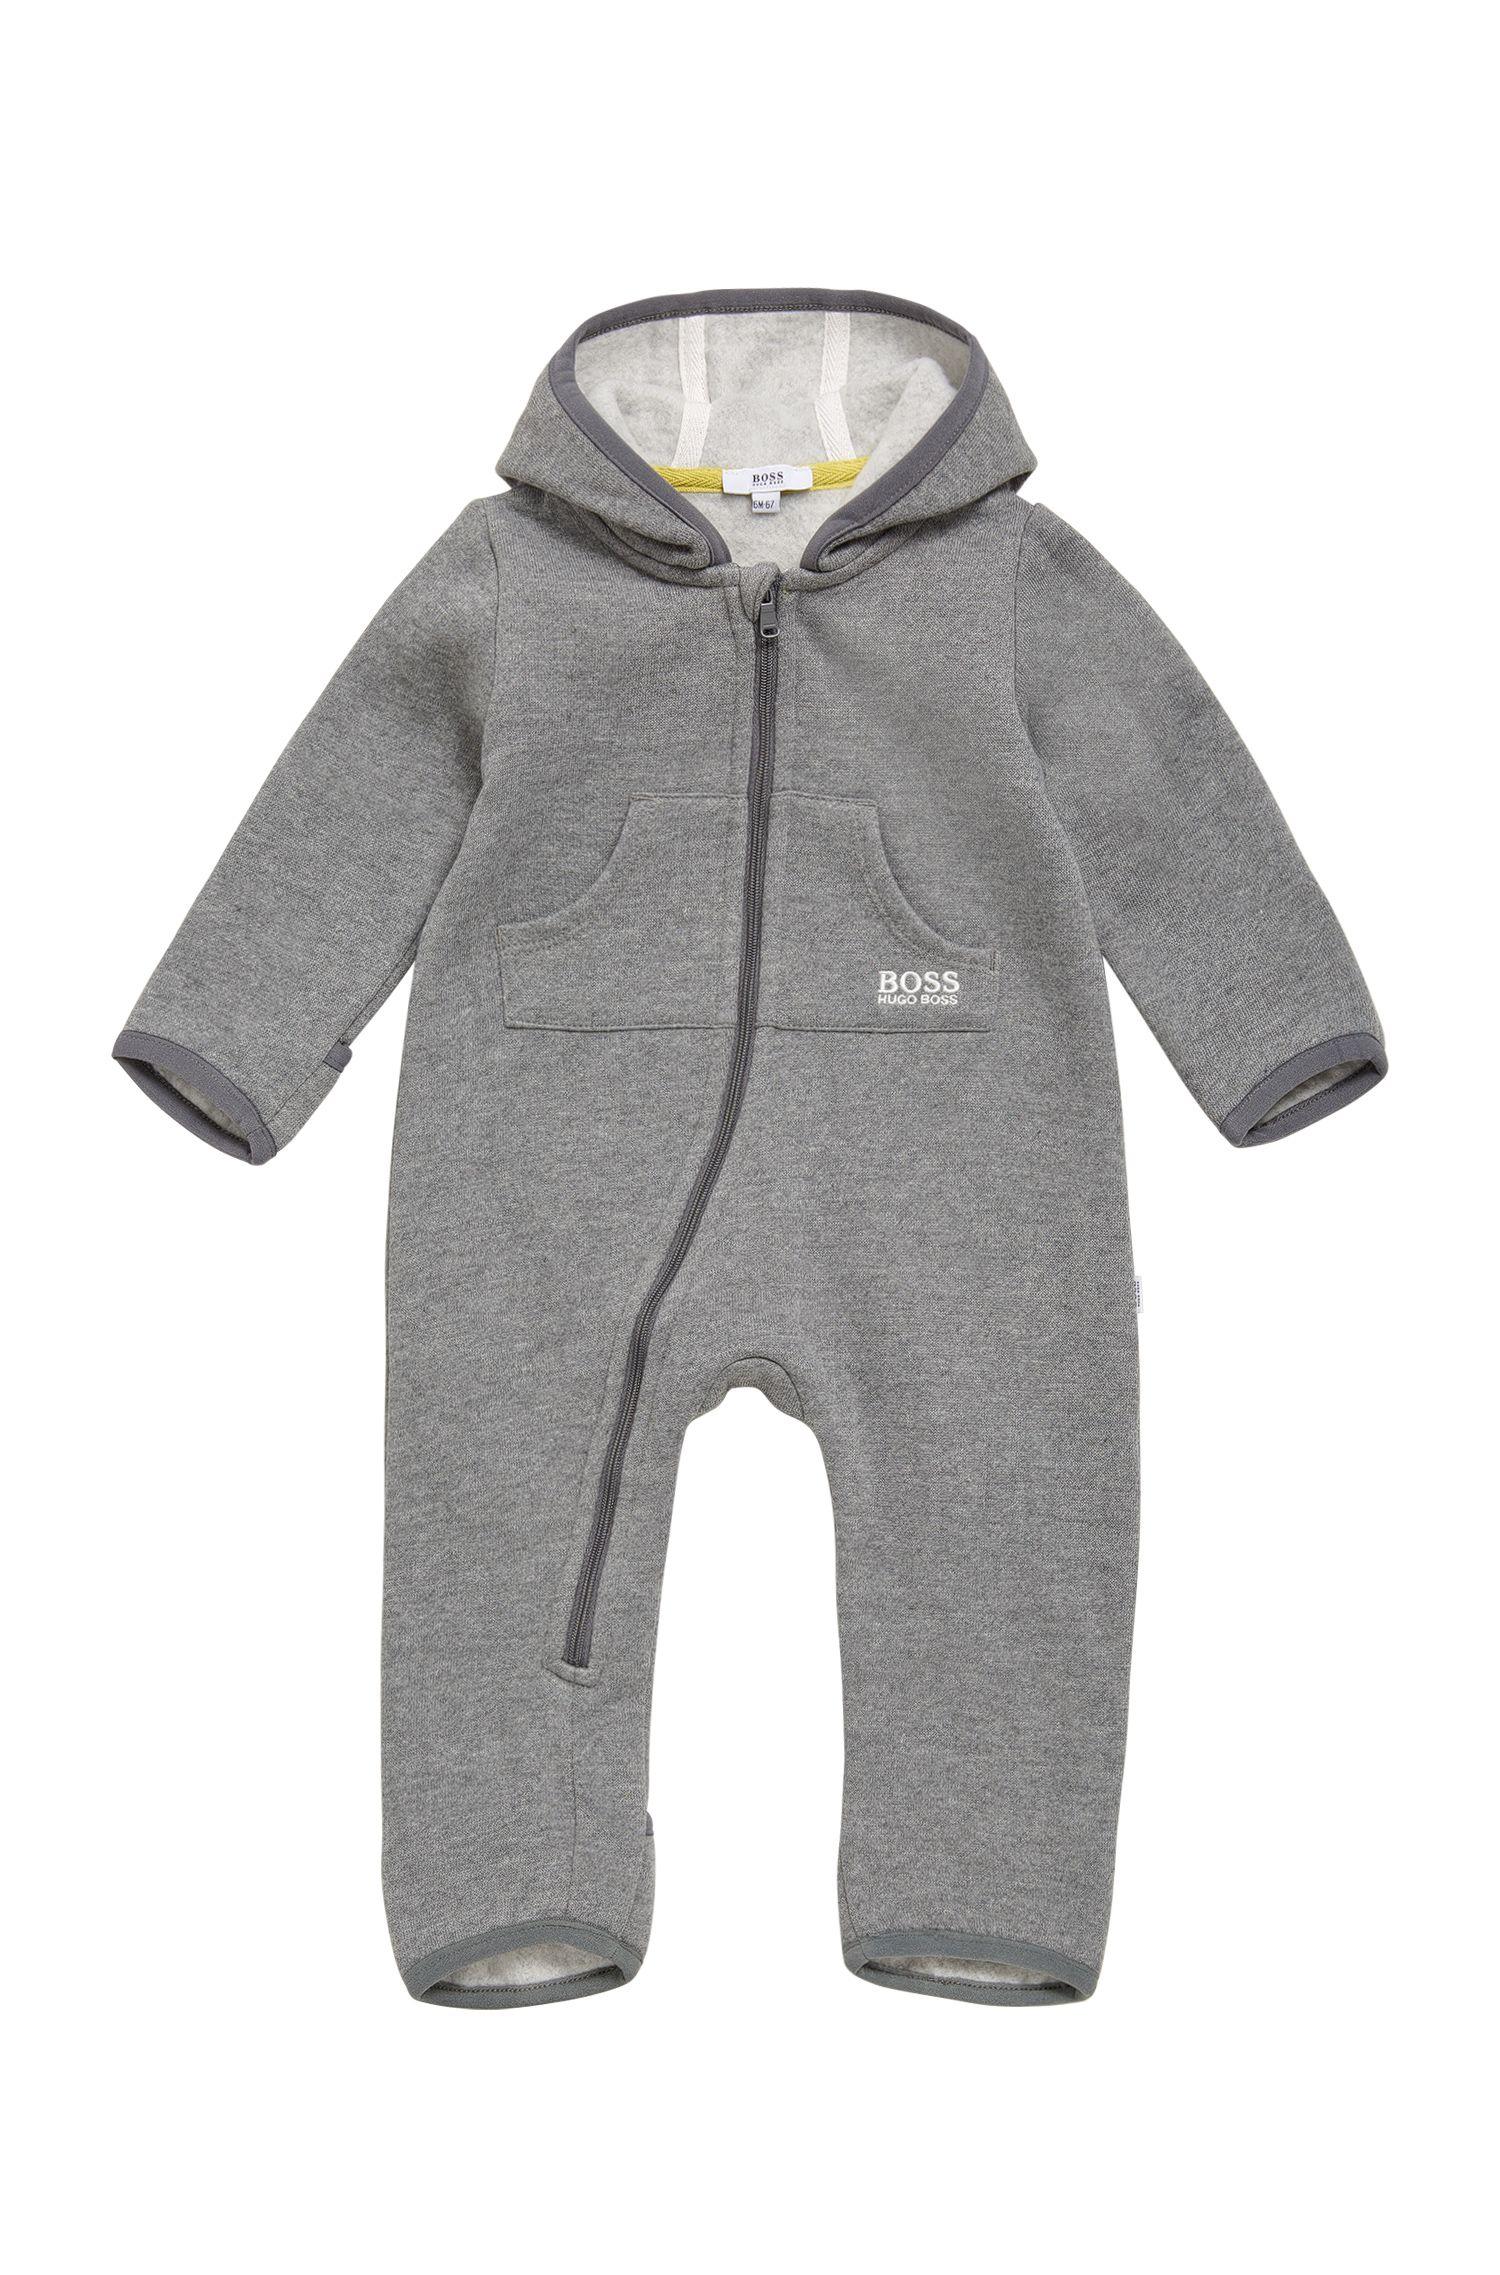 'J96059' | Newborn Hooded Sweatsuit Onesie